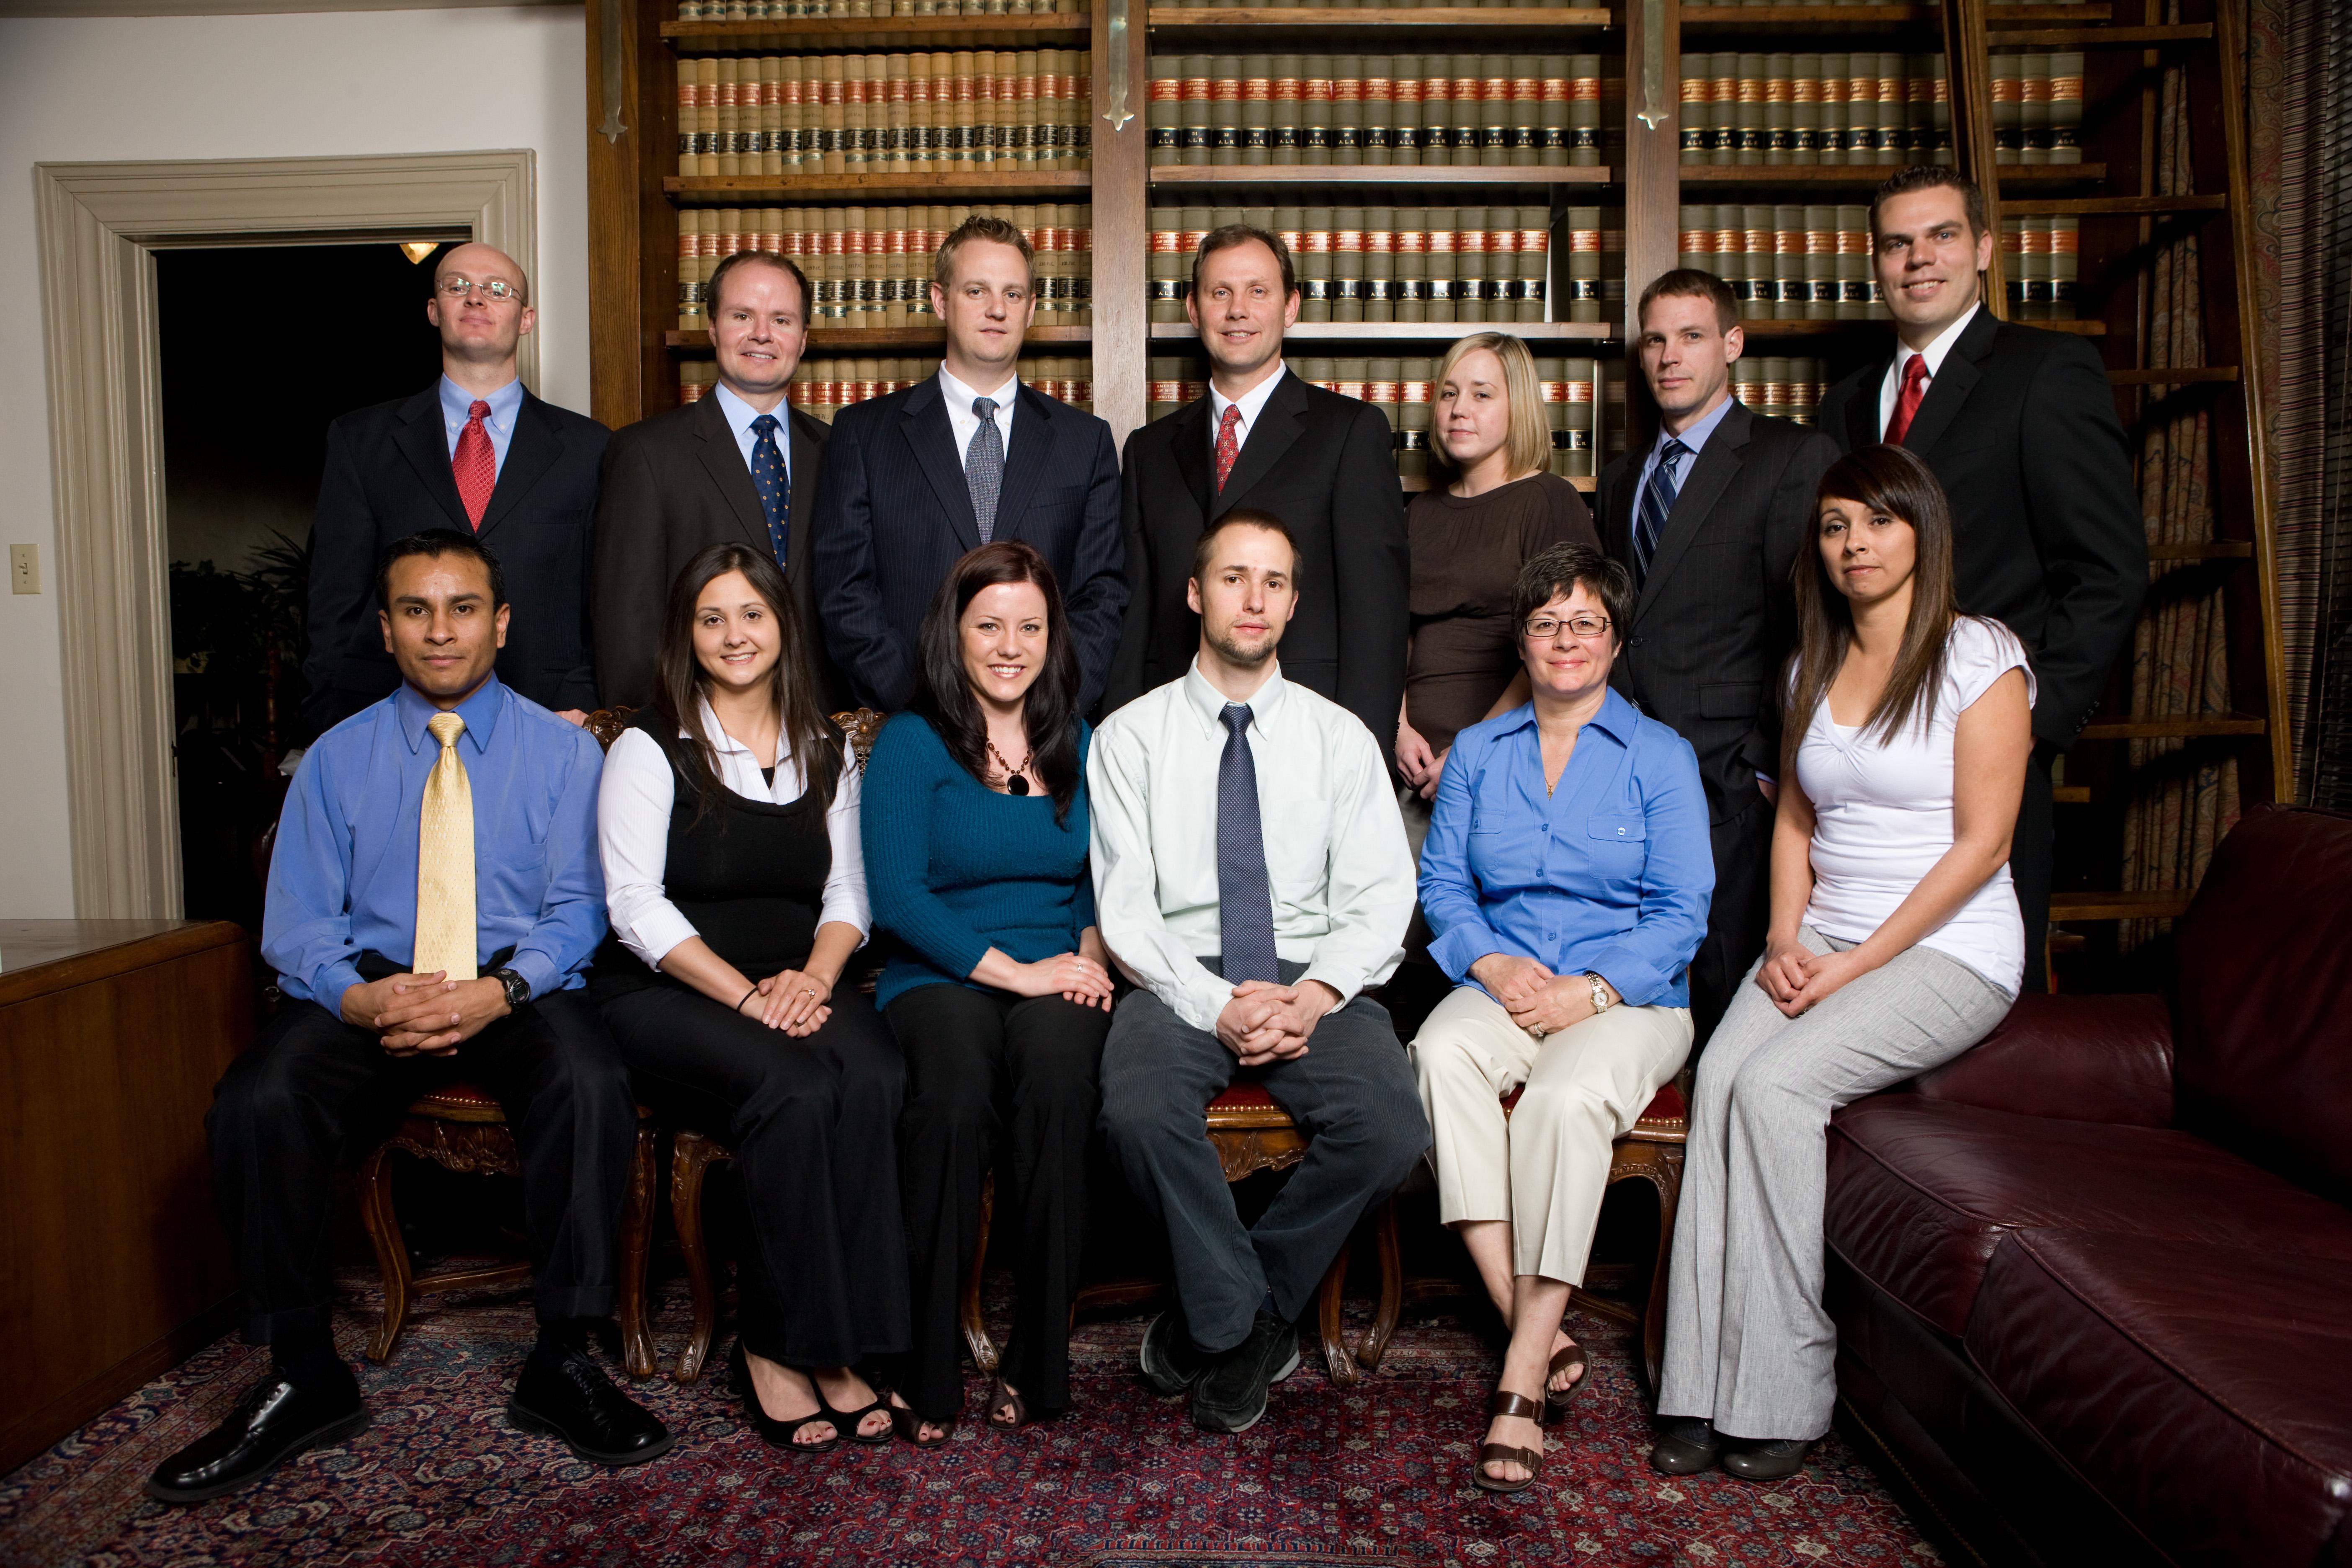 The Advocates image 2